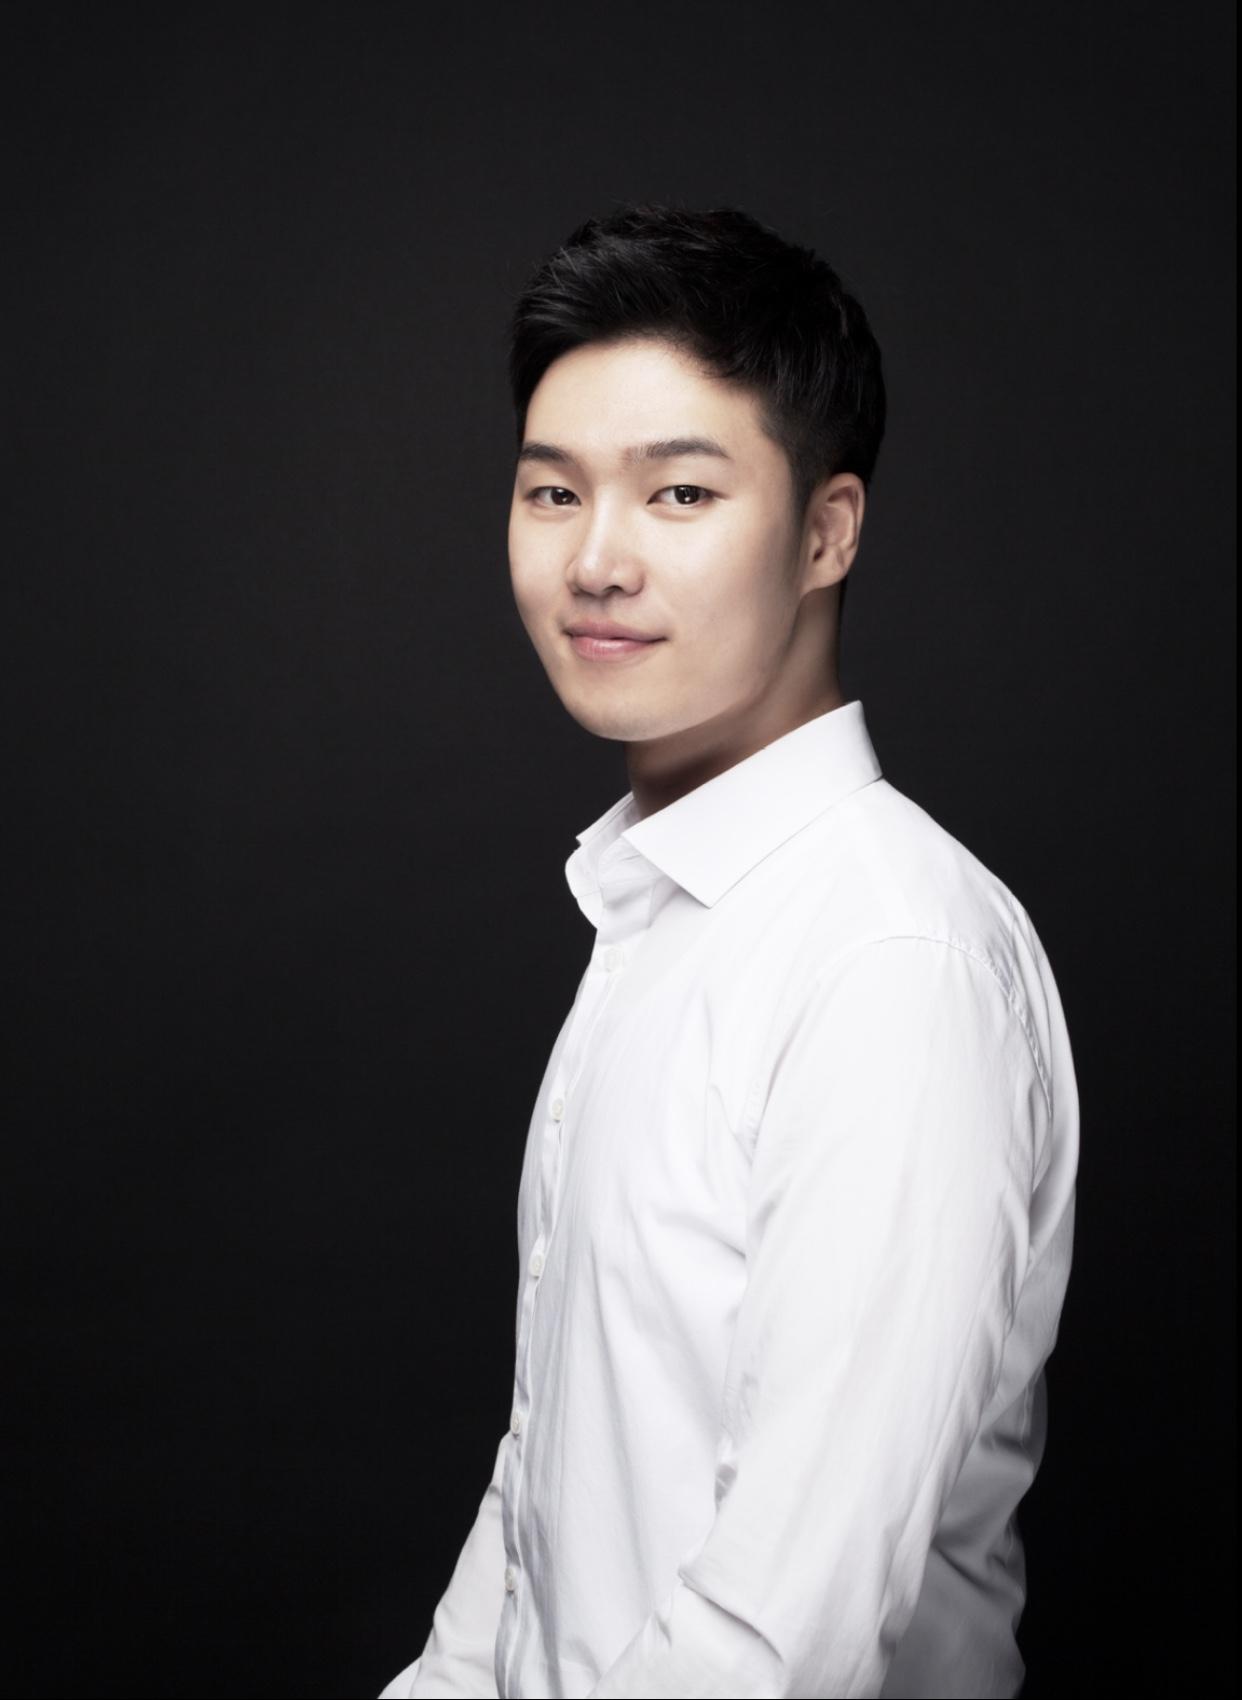 Minchul Shin